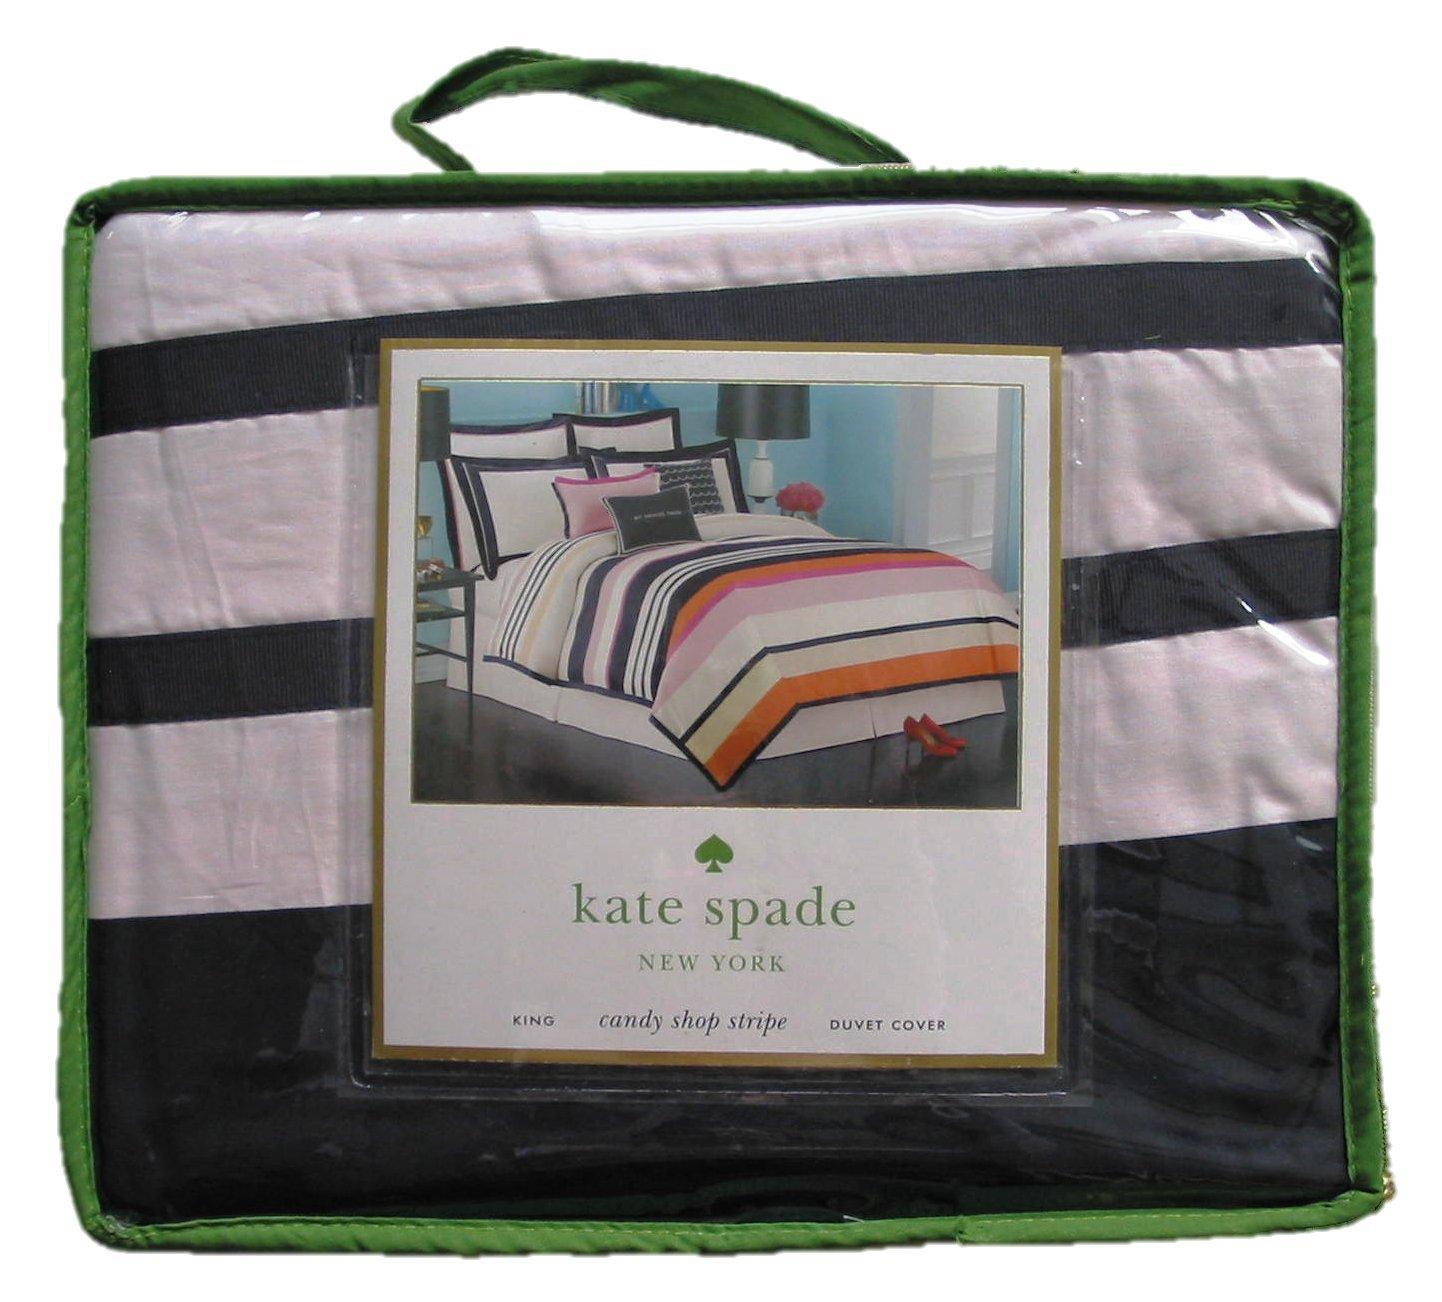 Kate Spade Duvet Cover Amazoncom Kate Spade New York Candy Shop Stripe Duvet Comforter